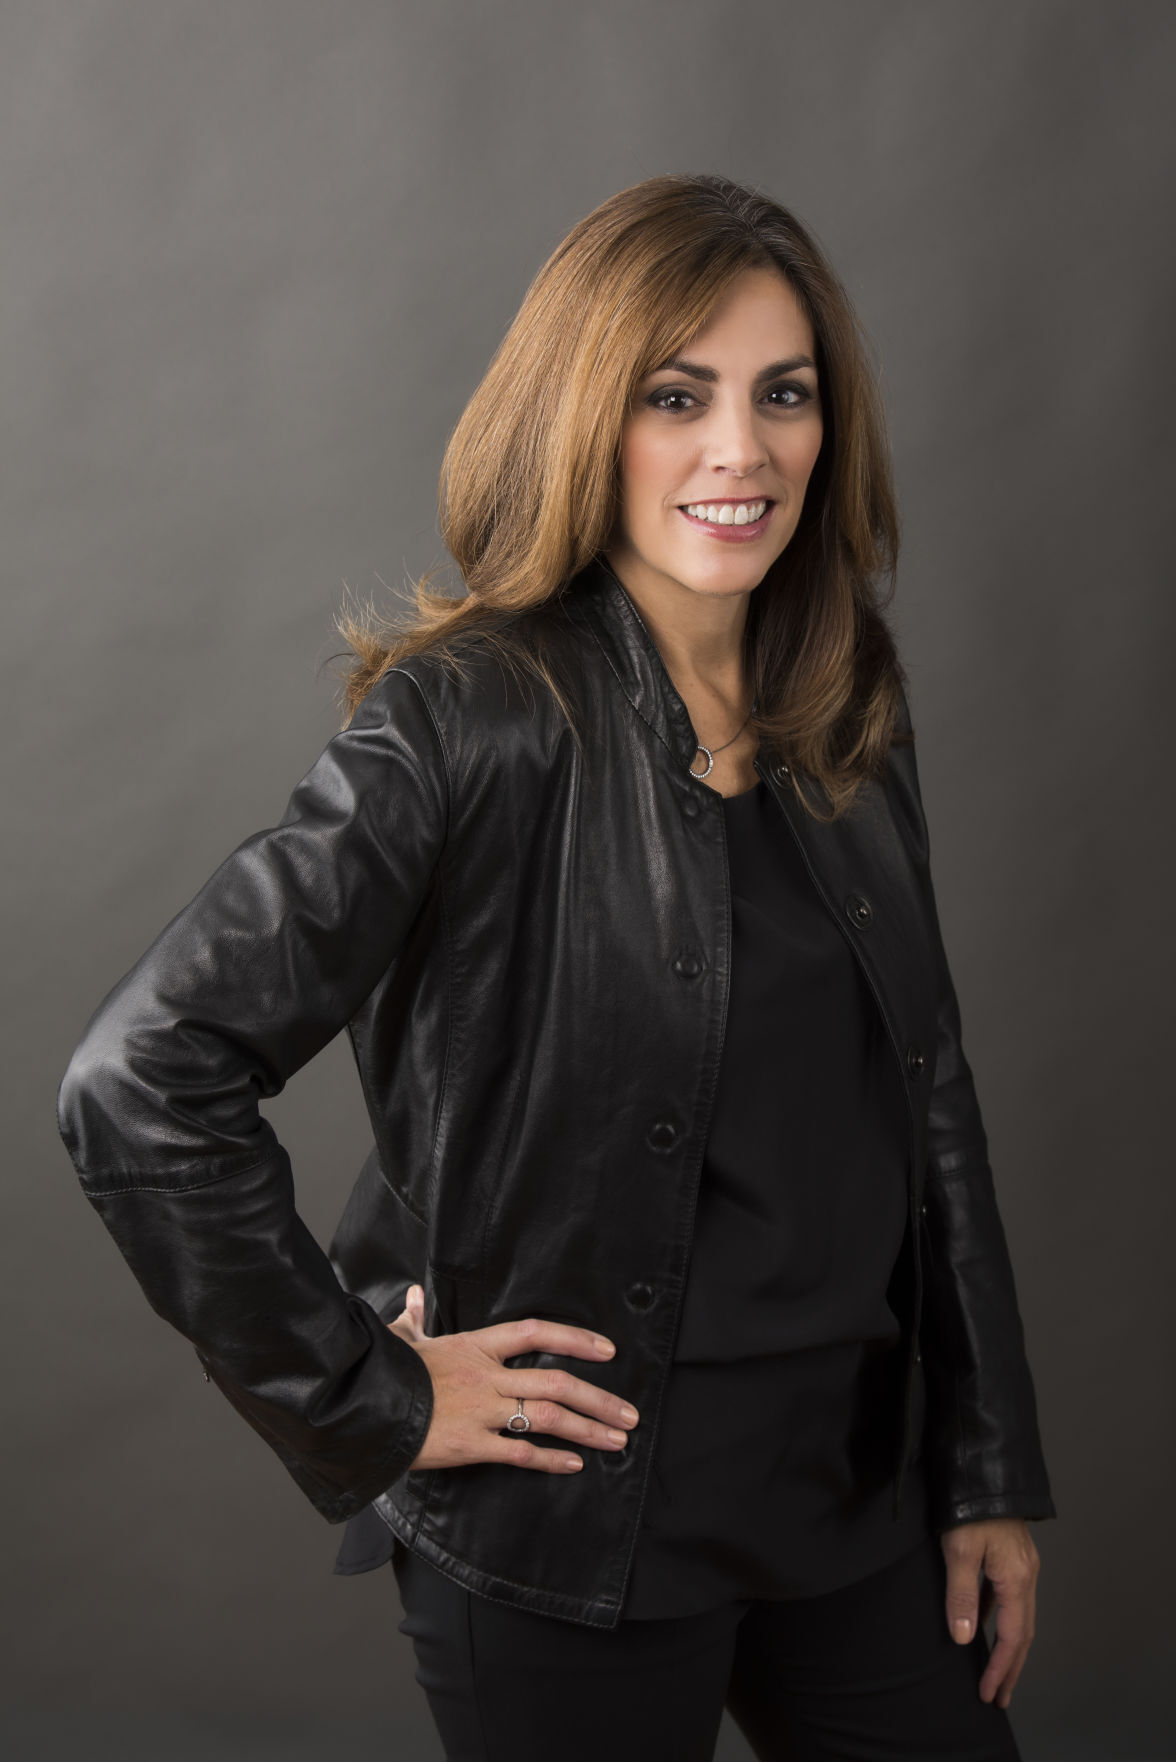 The Perfect Provenance Founder Lisa Lori